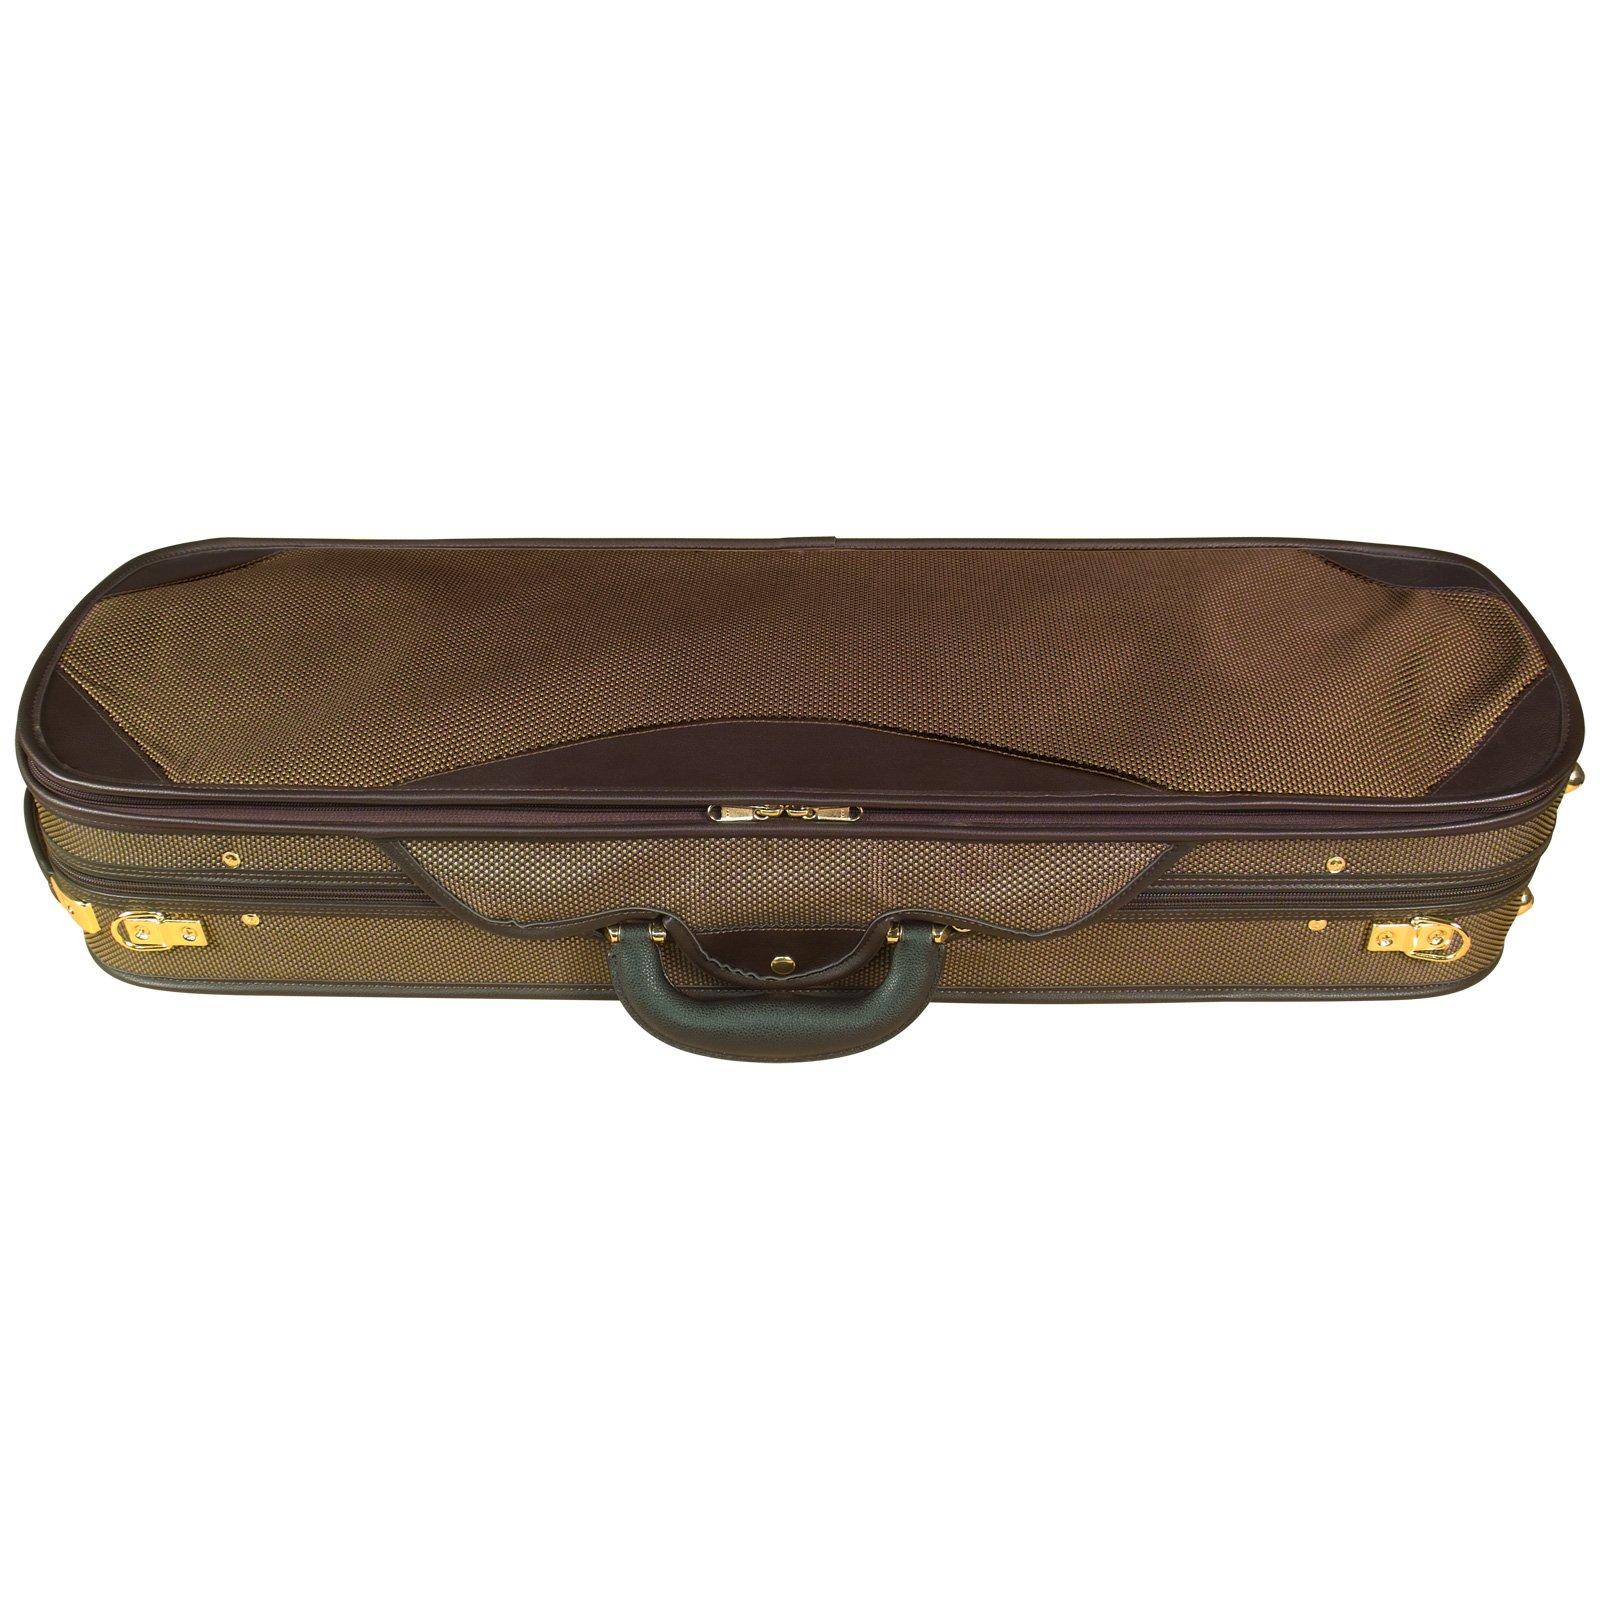 Baker Street BK-4020 Luxury Violin Case - Oblong by Baker Street Products (Image #2)